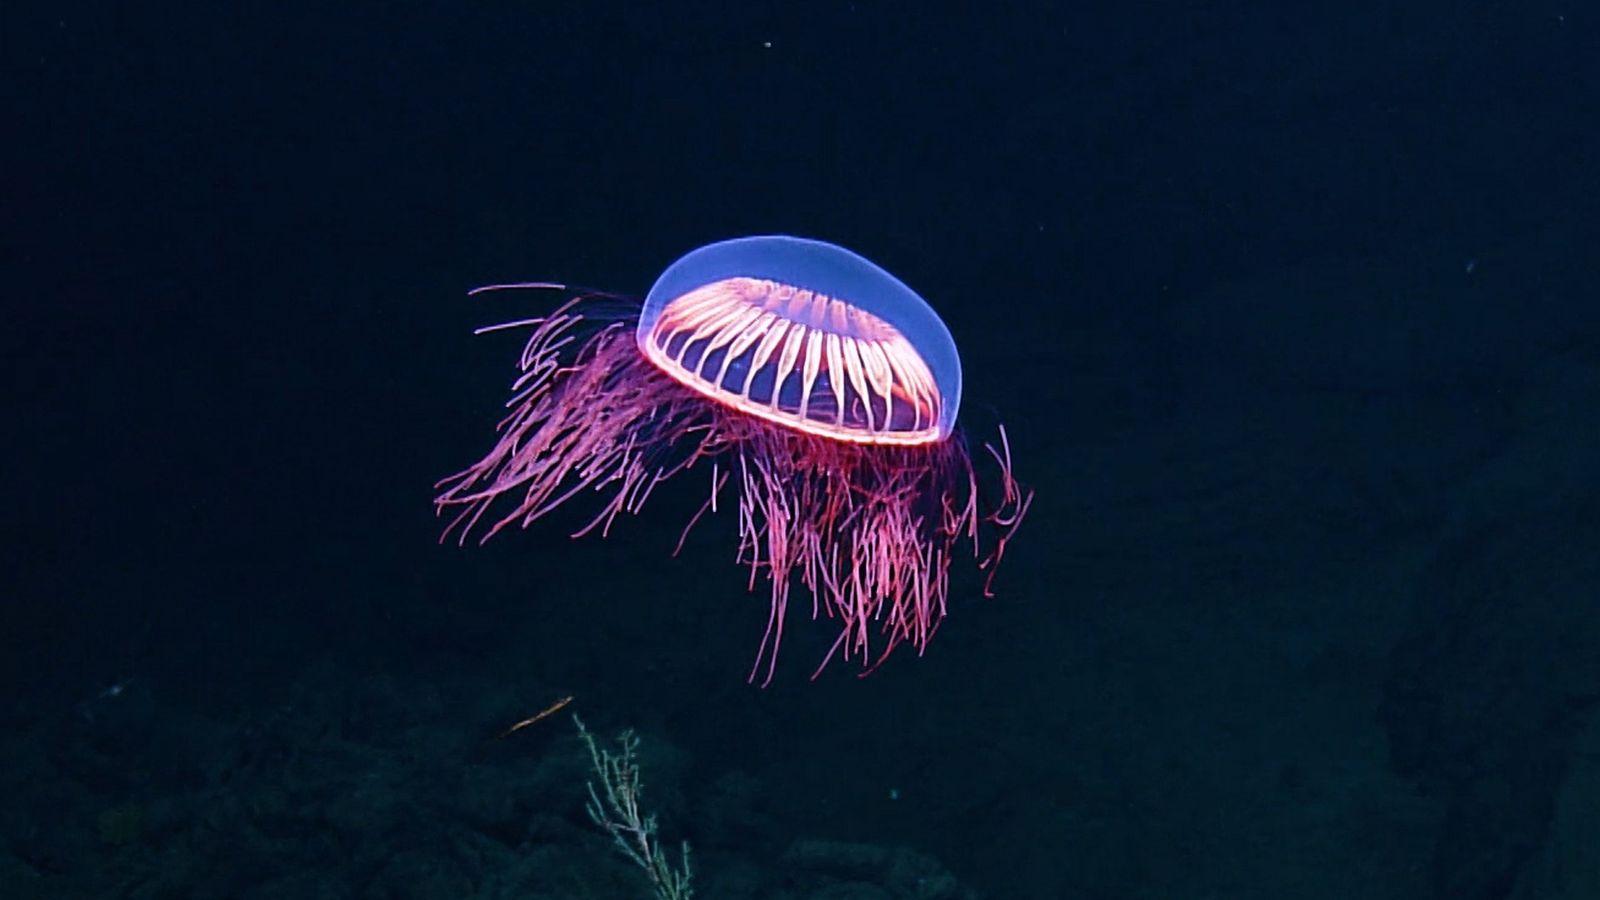 Spellbinding Jellyfish Spotted in Rare Deep Sea Footage